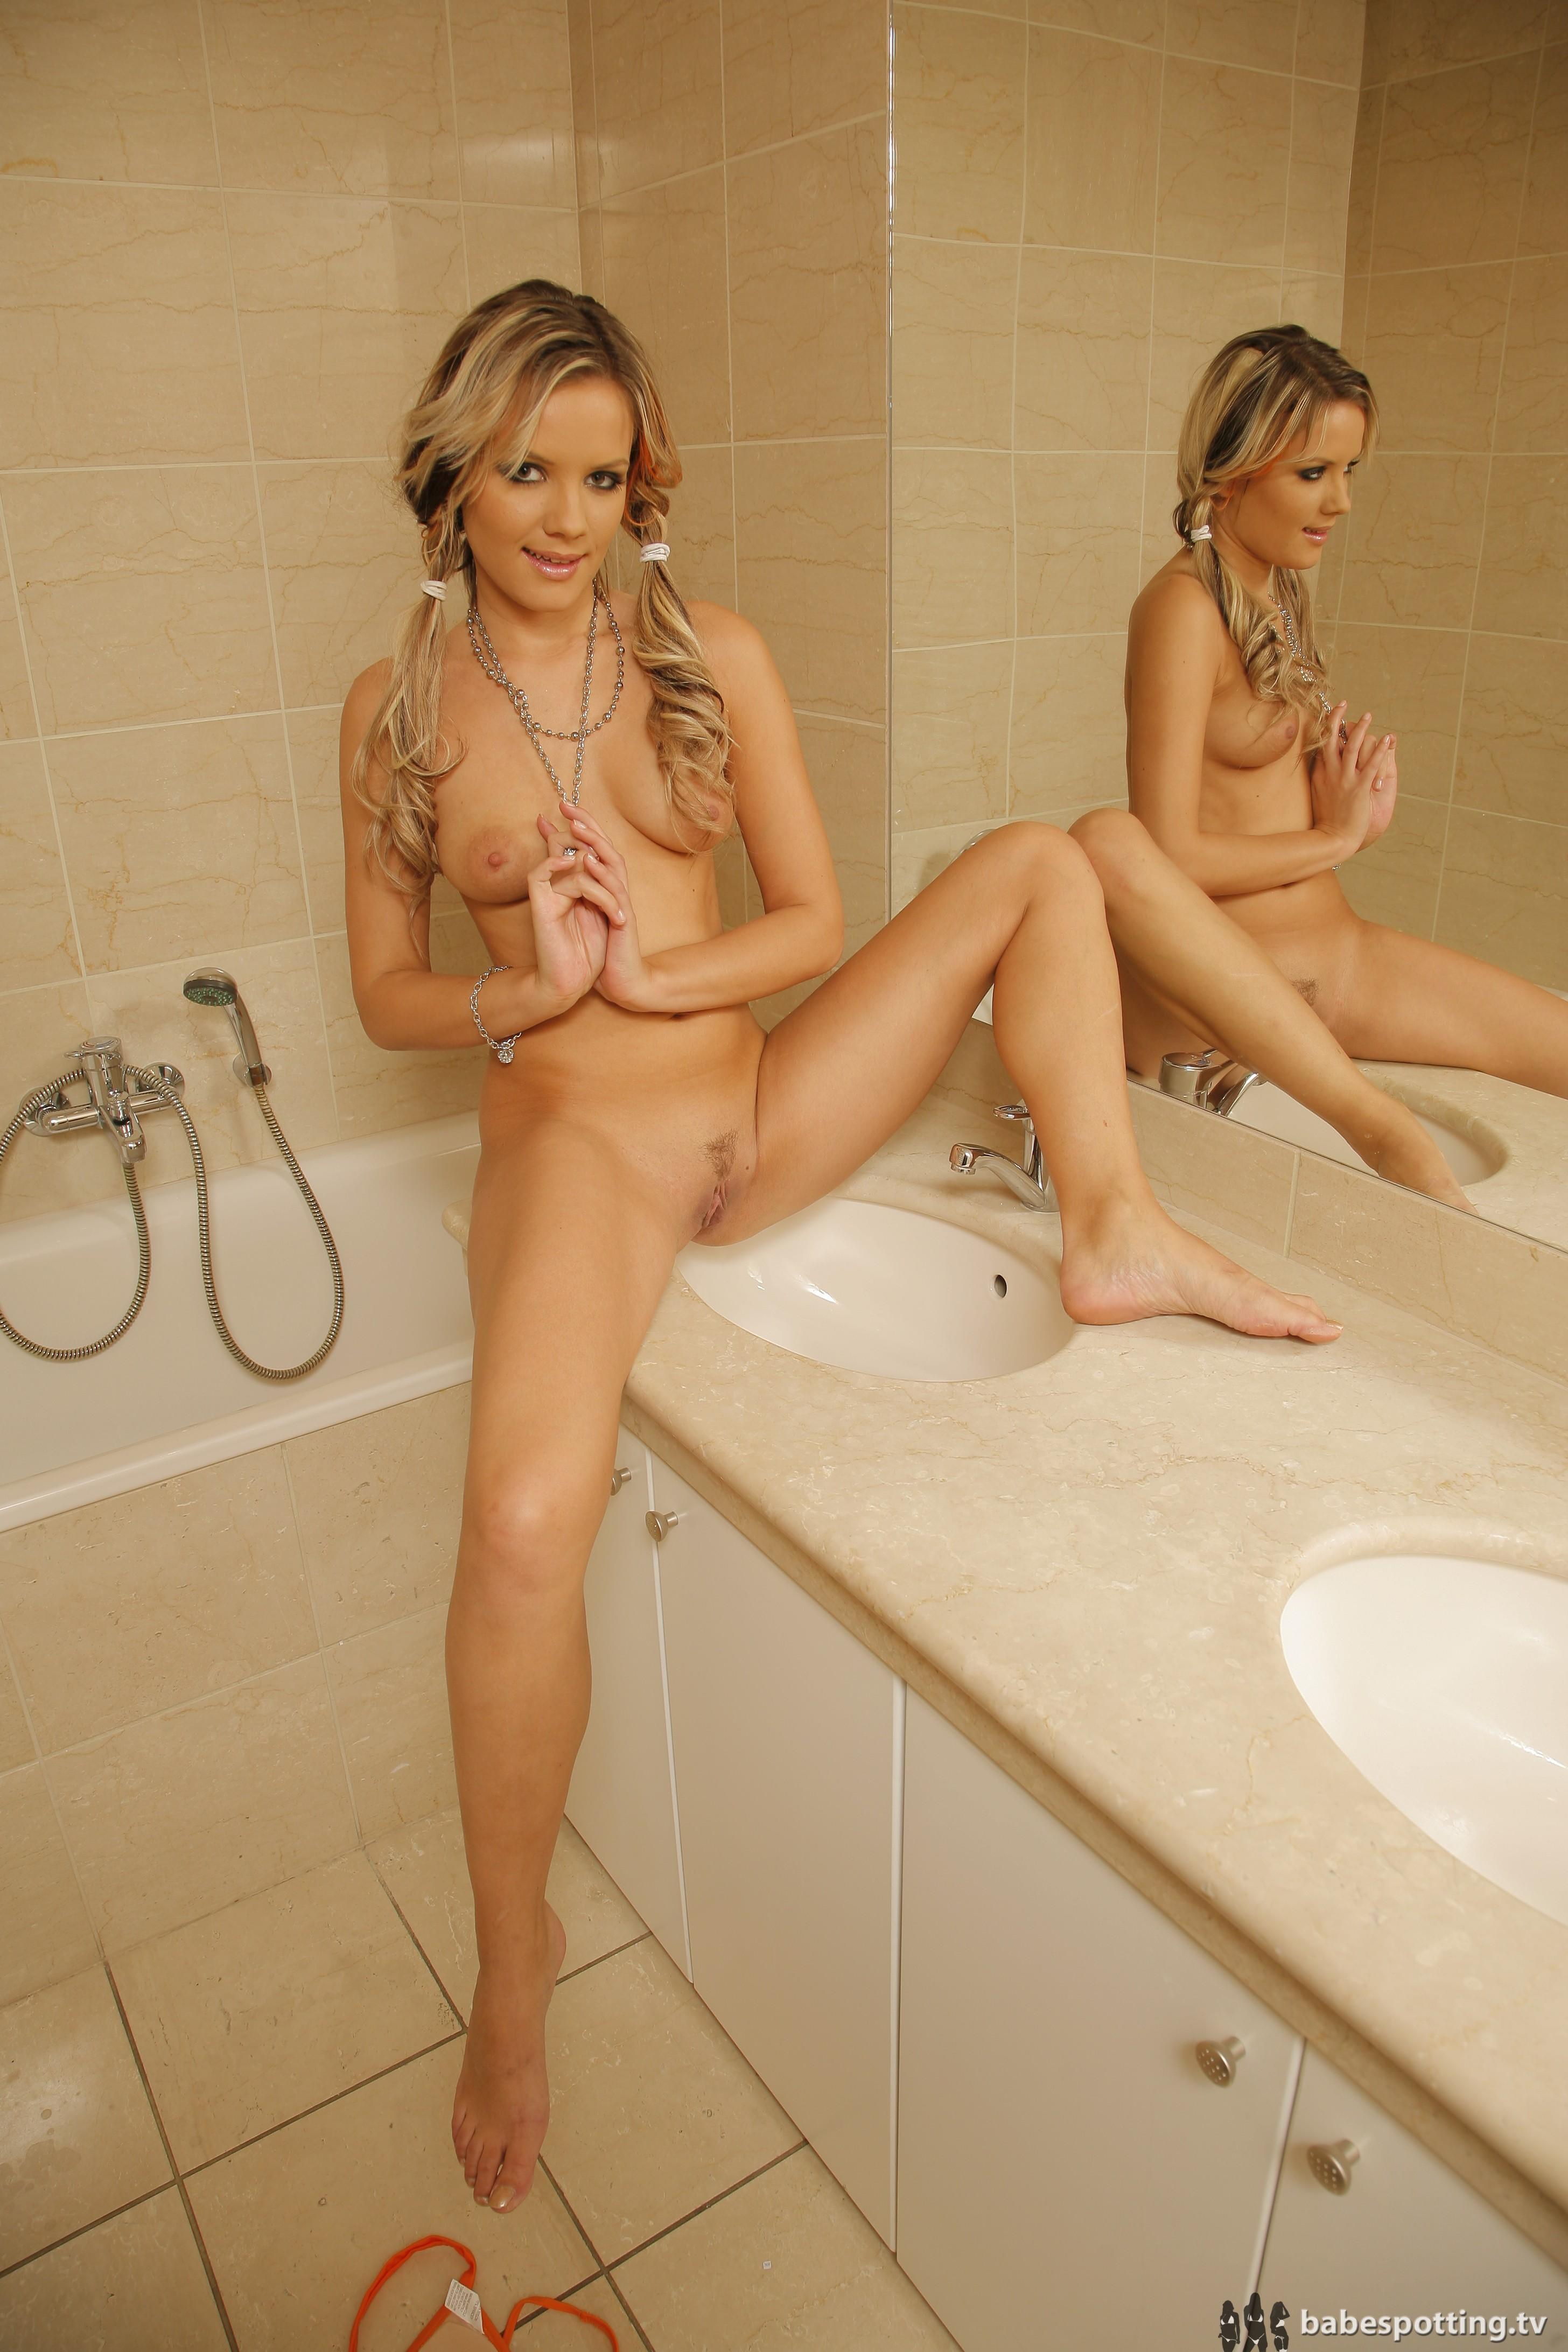 young-babe-bath-nude-bangla-nagit-phato